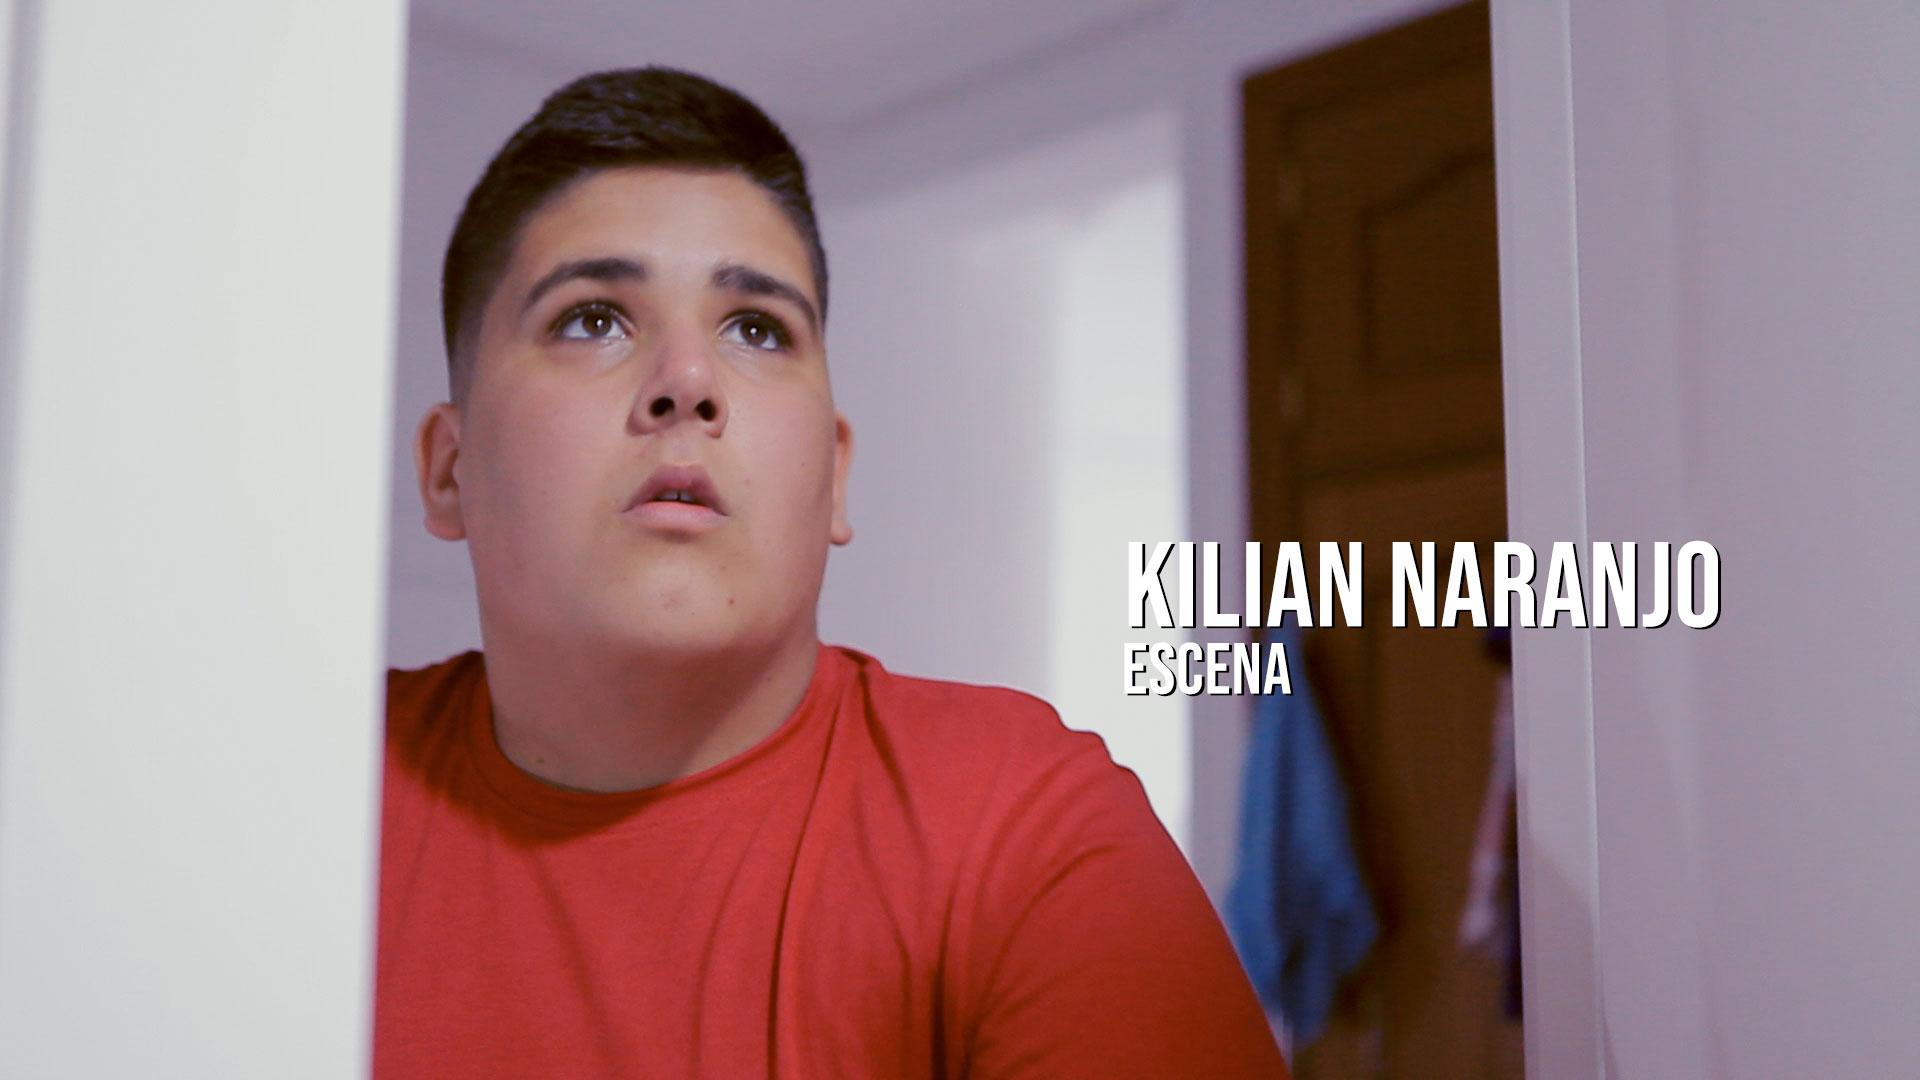 Kilian Naranjo - Escena Actor